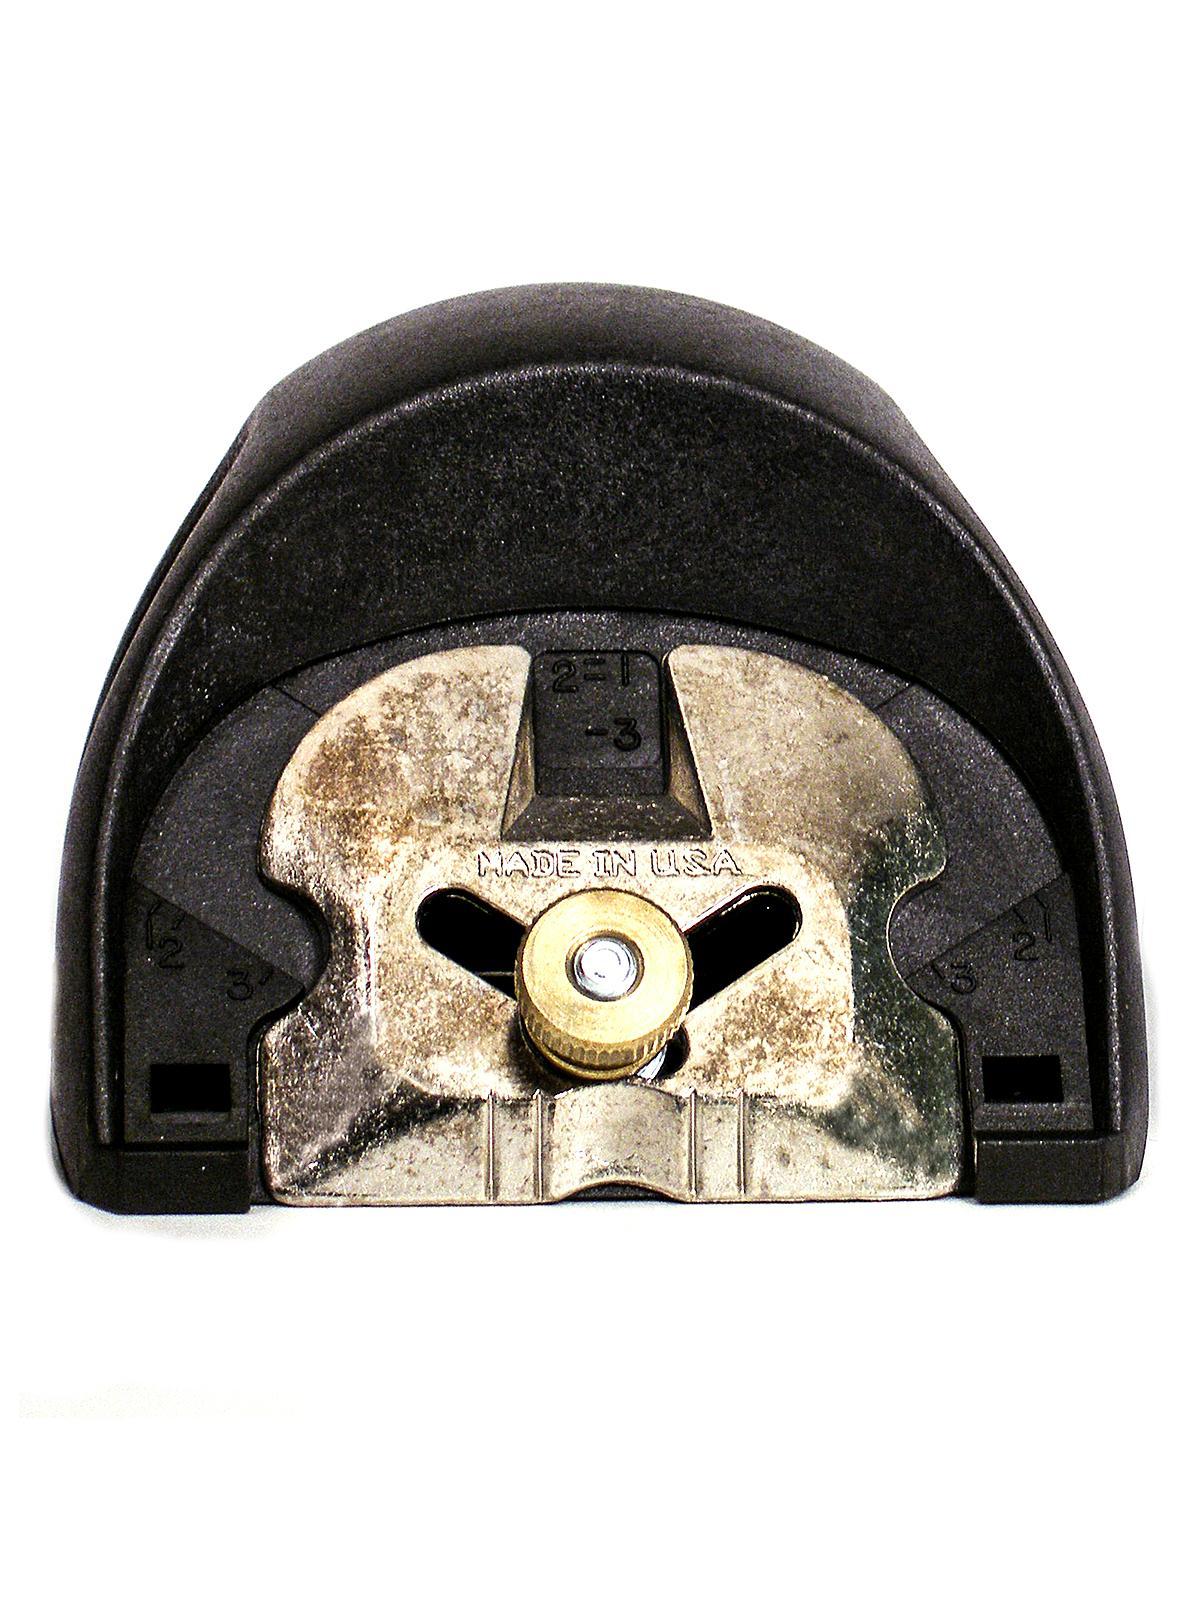 MatMate 101 Bevel Cutter